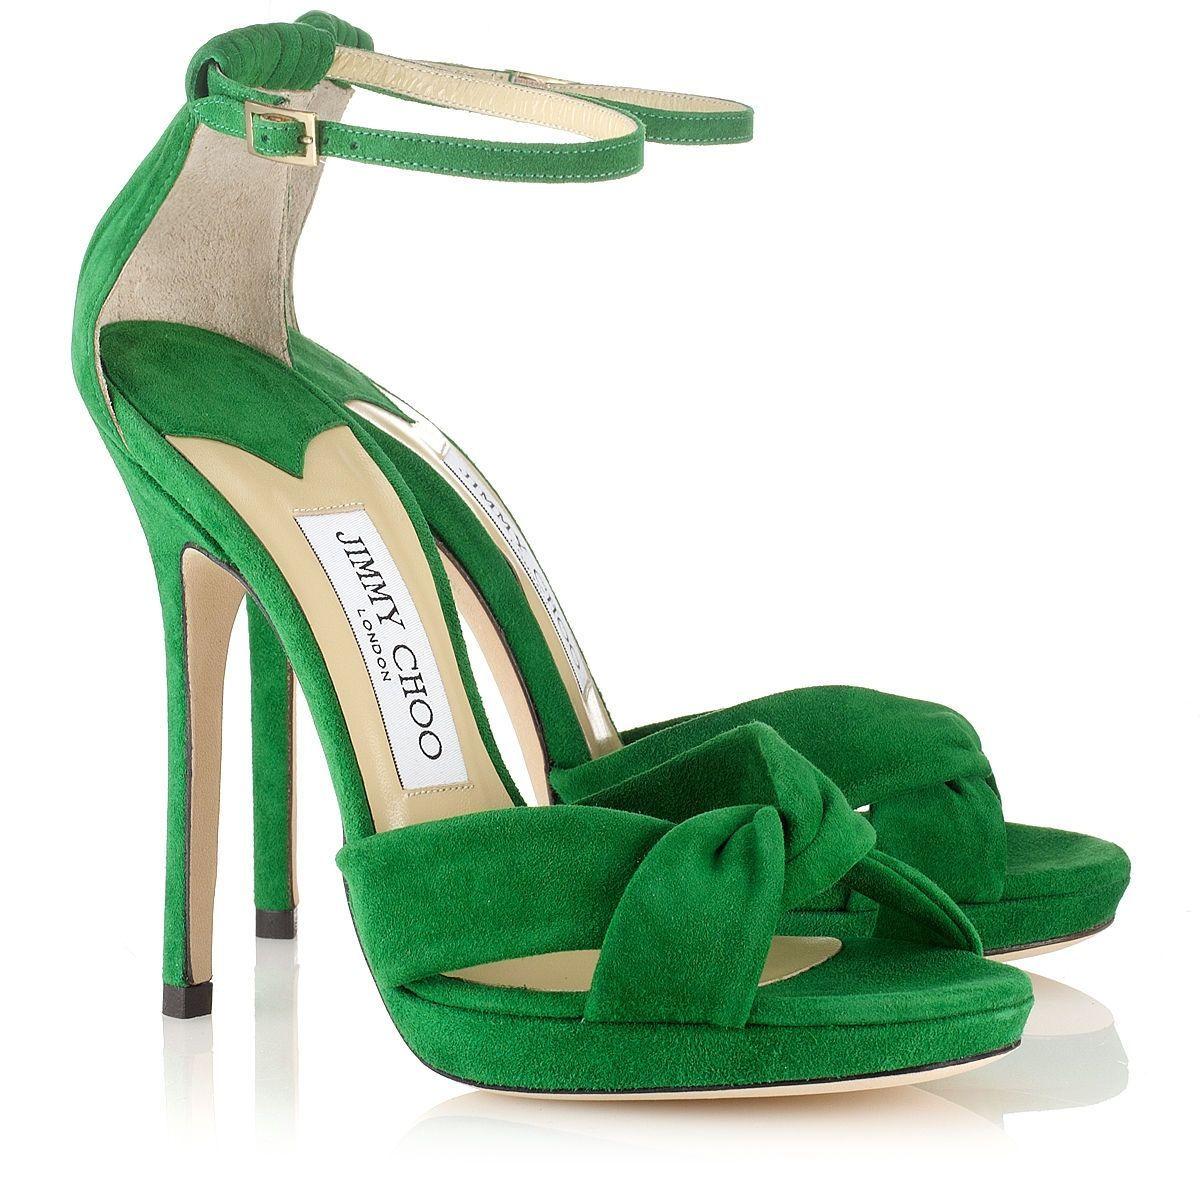 6fb997d365c Jimmy Choo - Jada - 132jadasue - Emerald Suede Platform Sandals ...